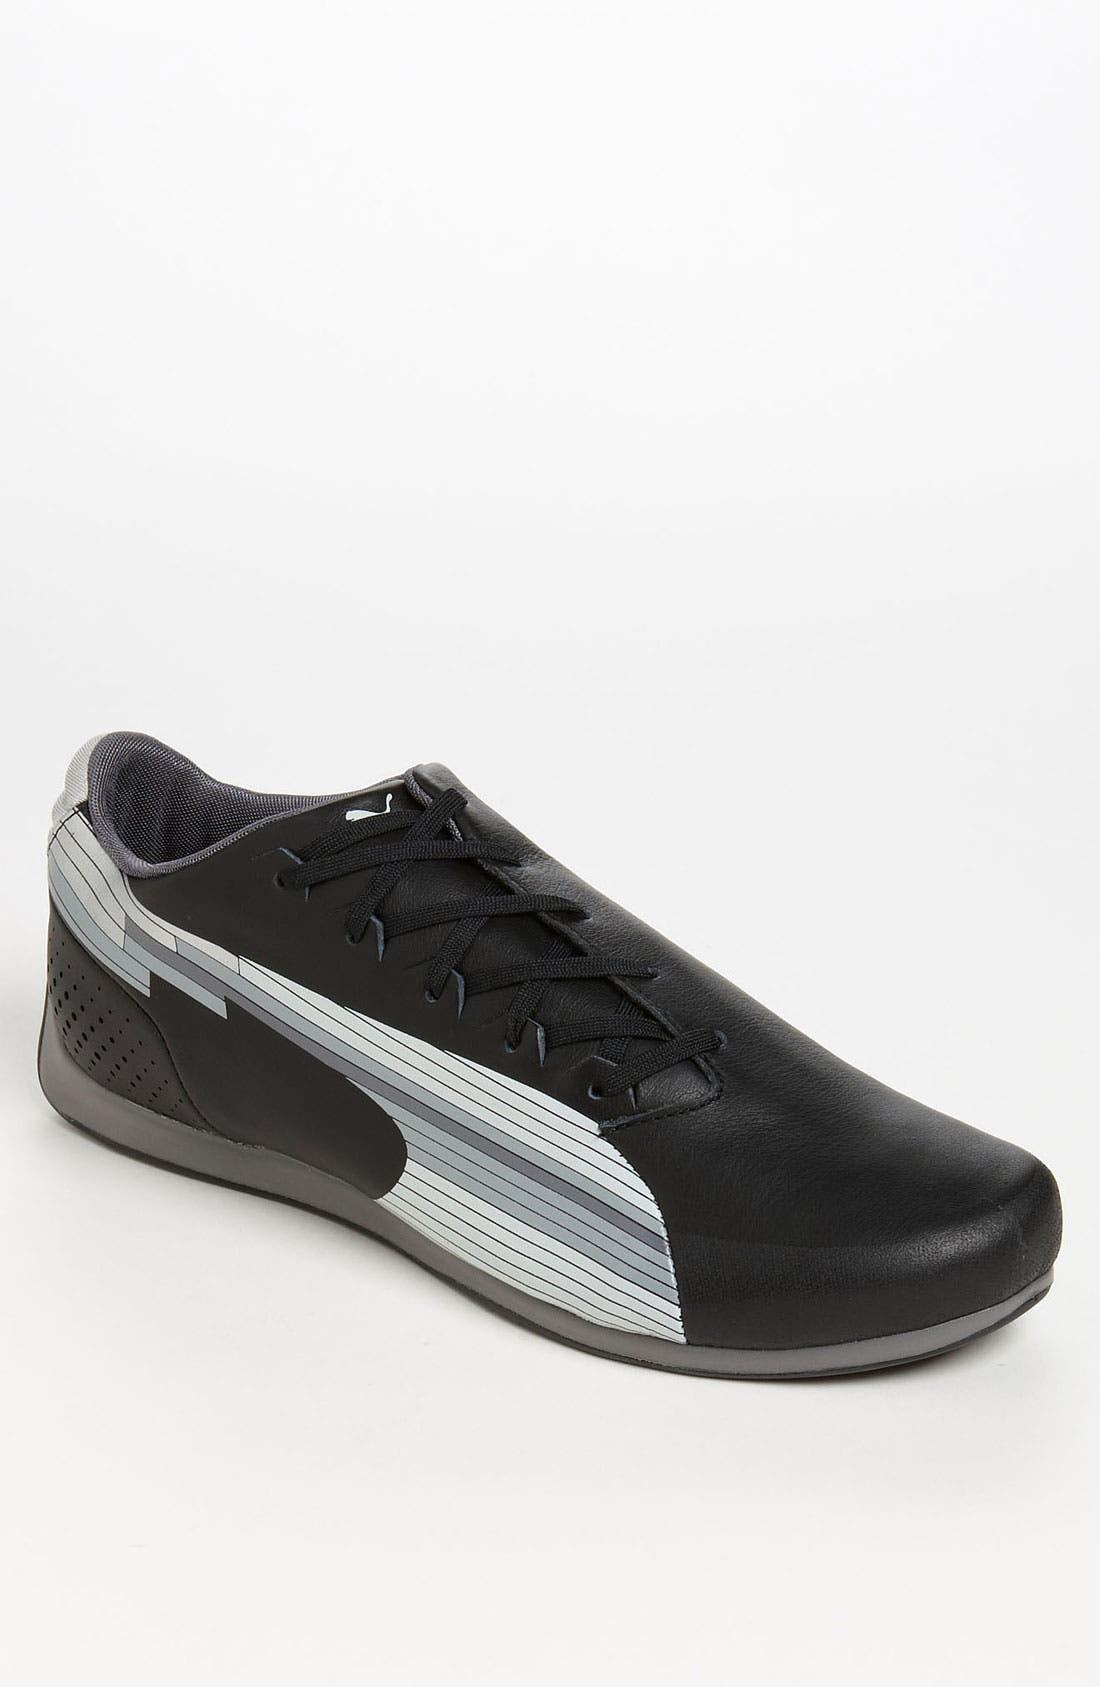 Main Image - PUMA 'evoSPEED F1' Sneaker (Men)